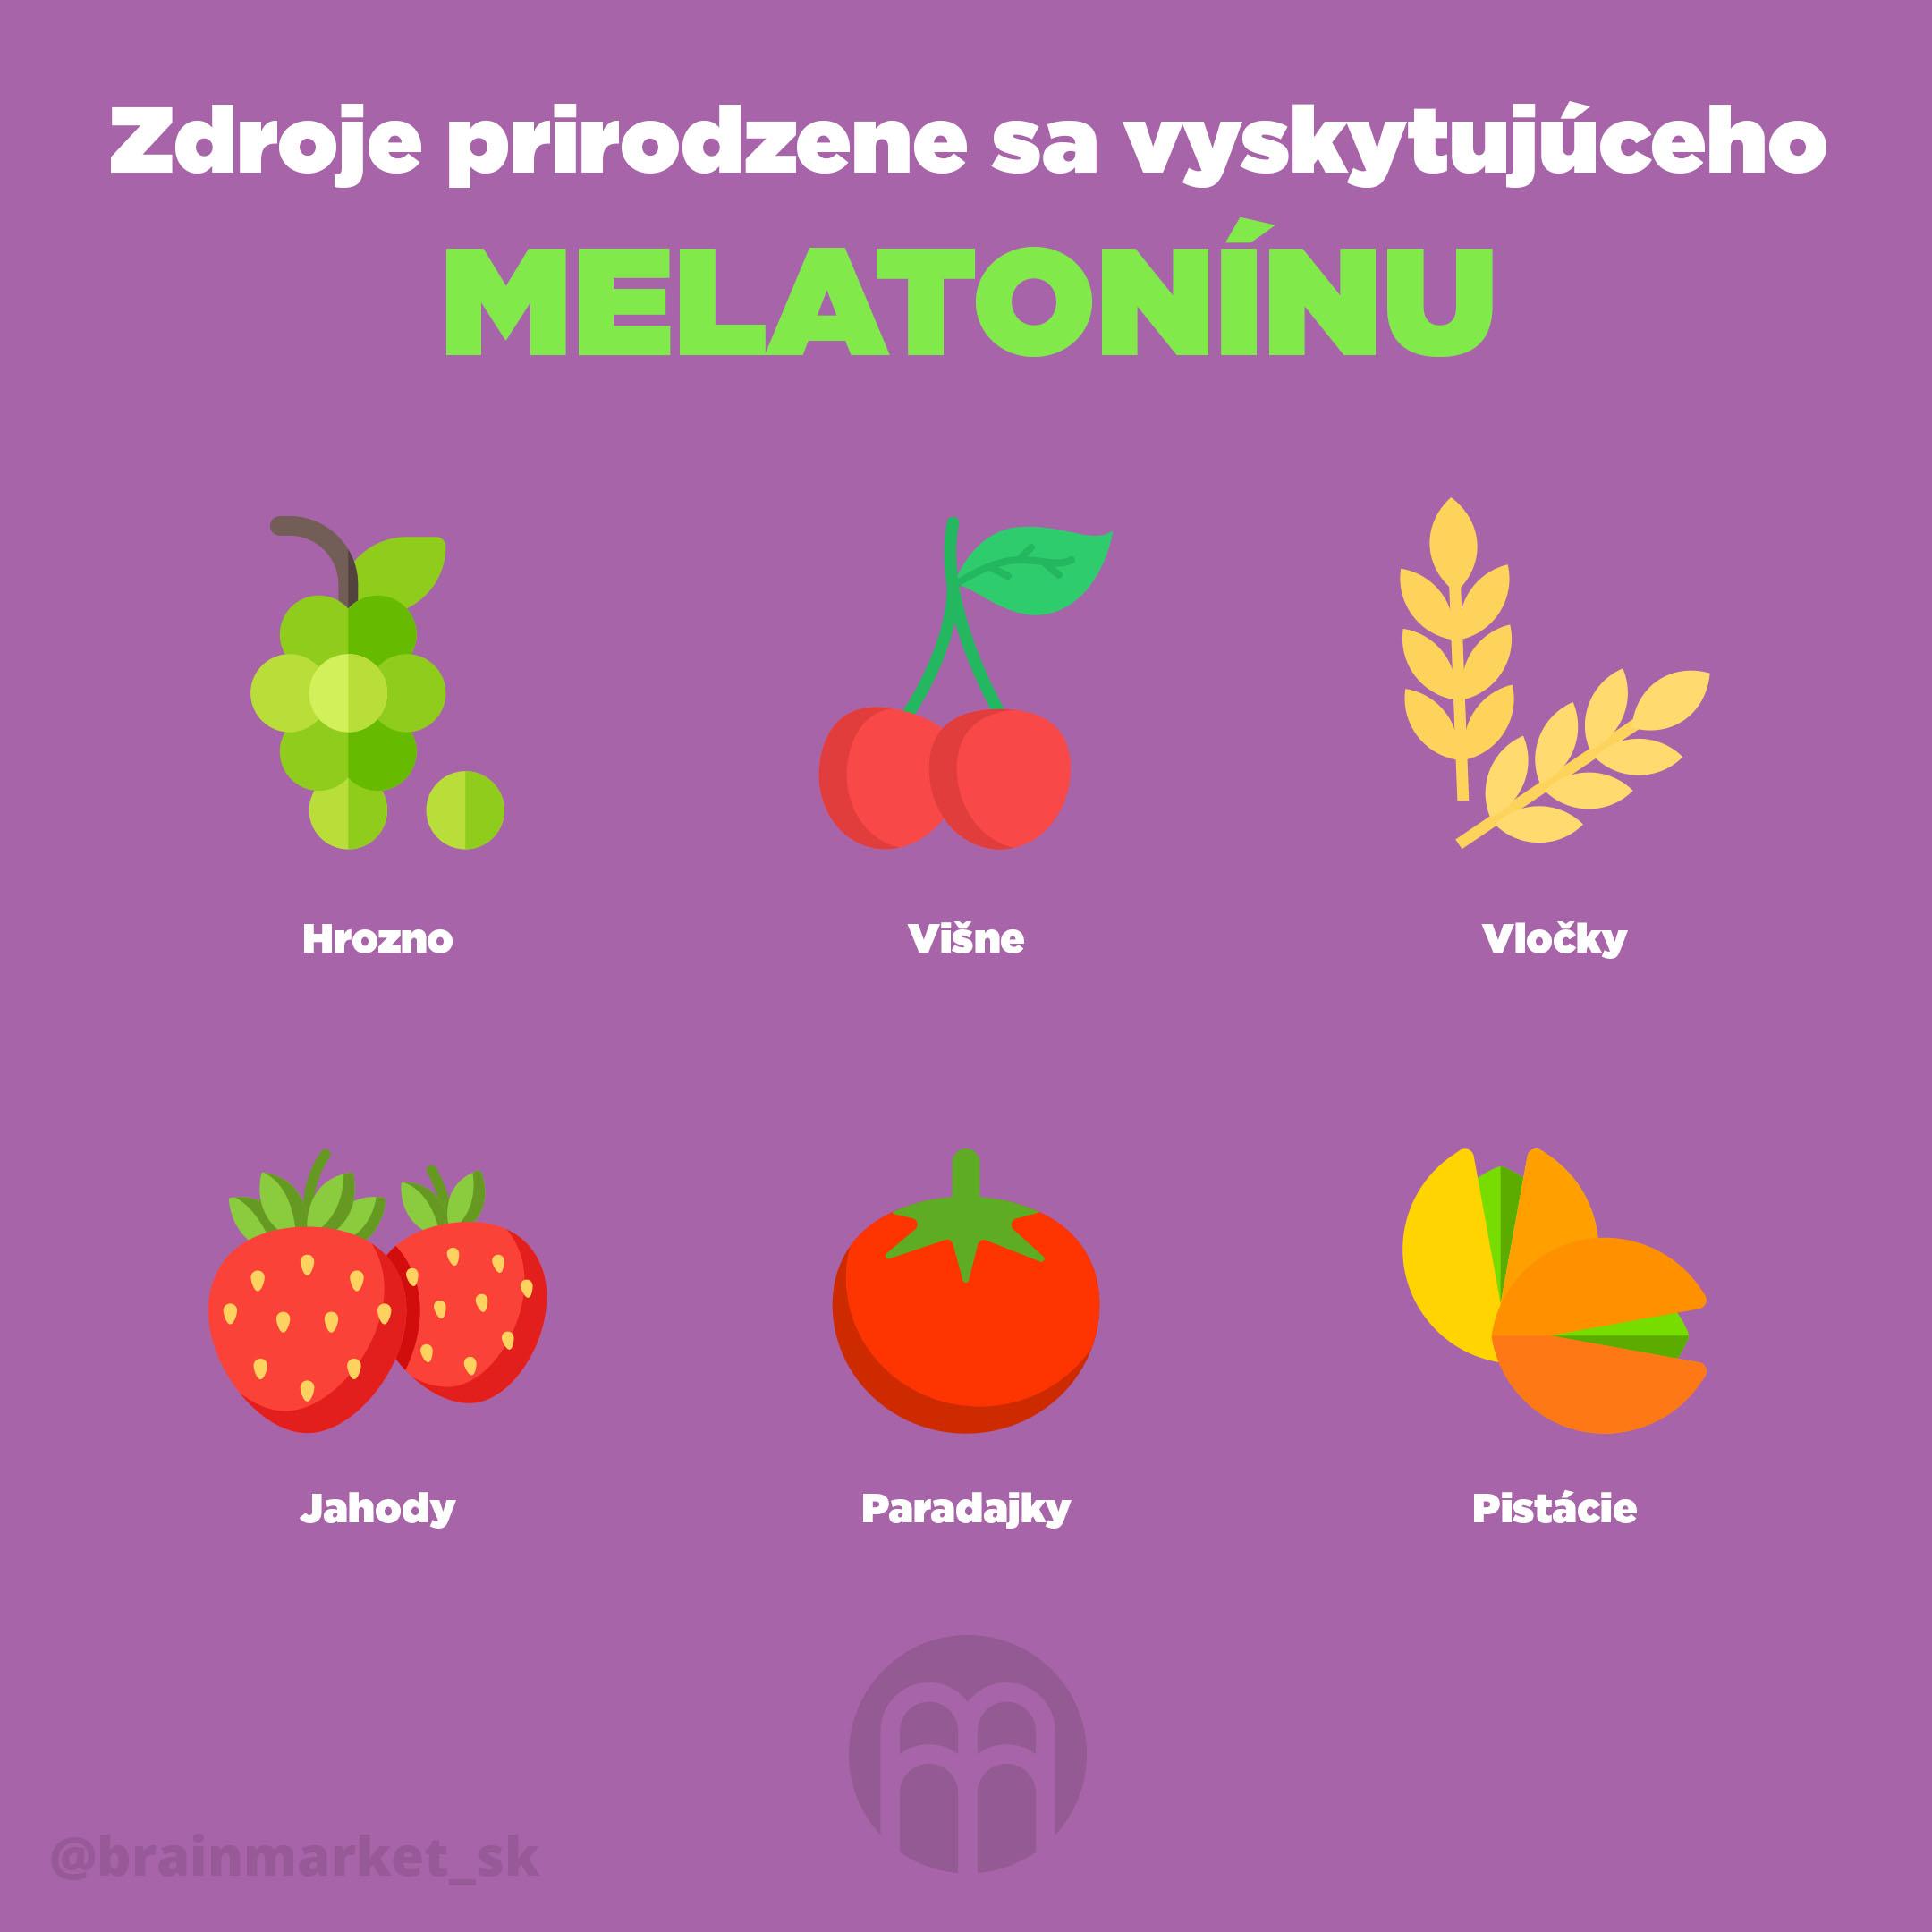 prirodzene_zdroje_melatoninu_SK_Infografika_Instagram_BrainMarket